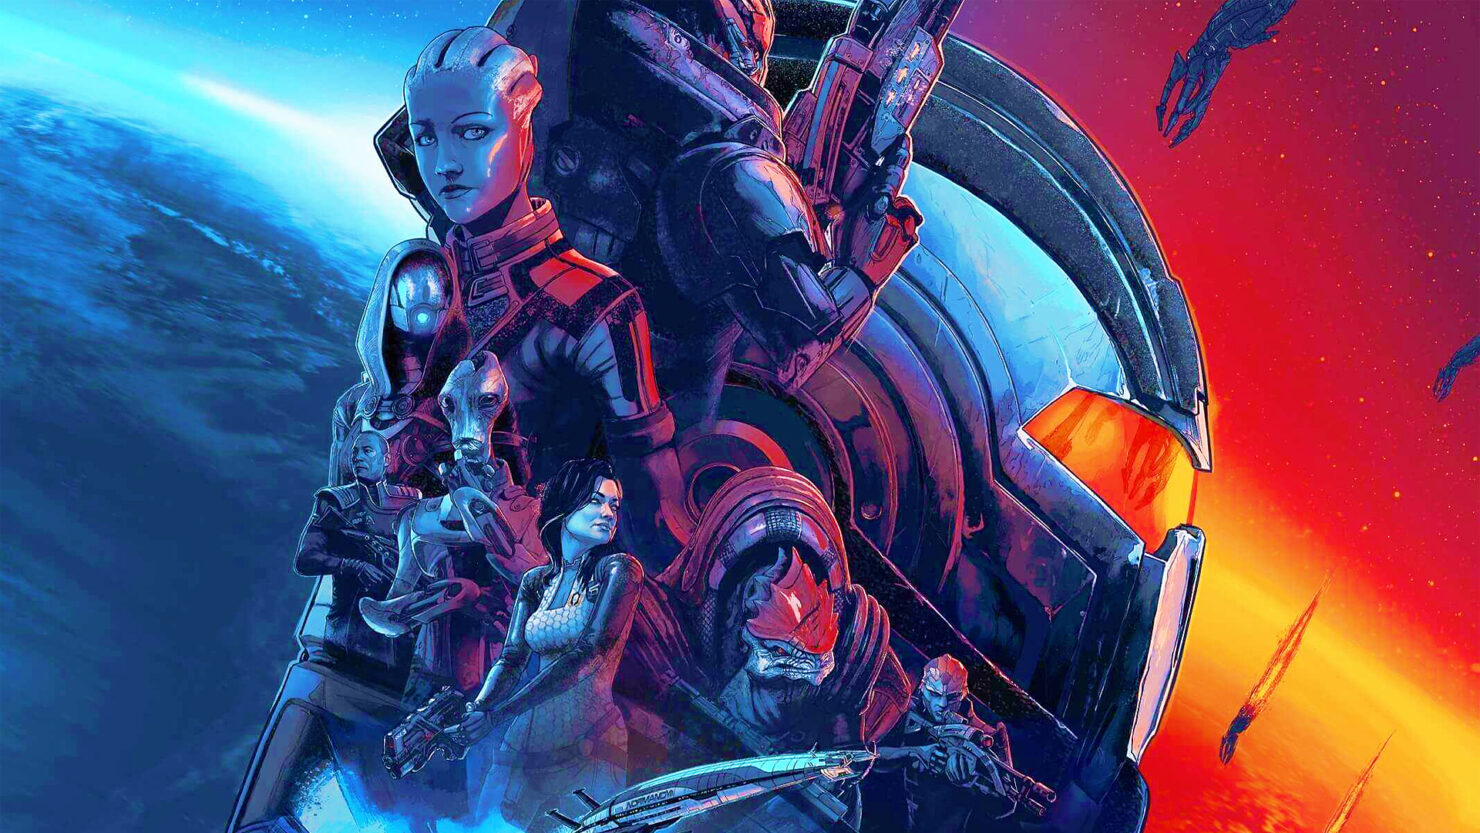 Mass Effect Legendary Edition Day One Update